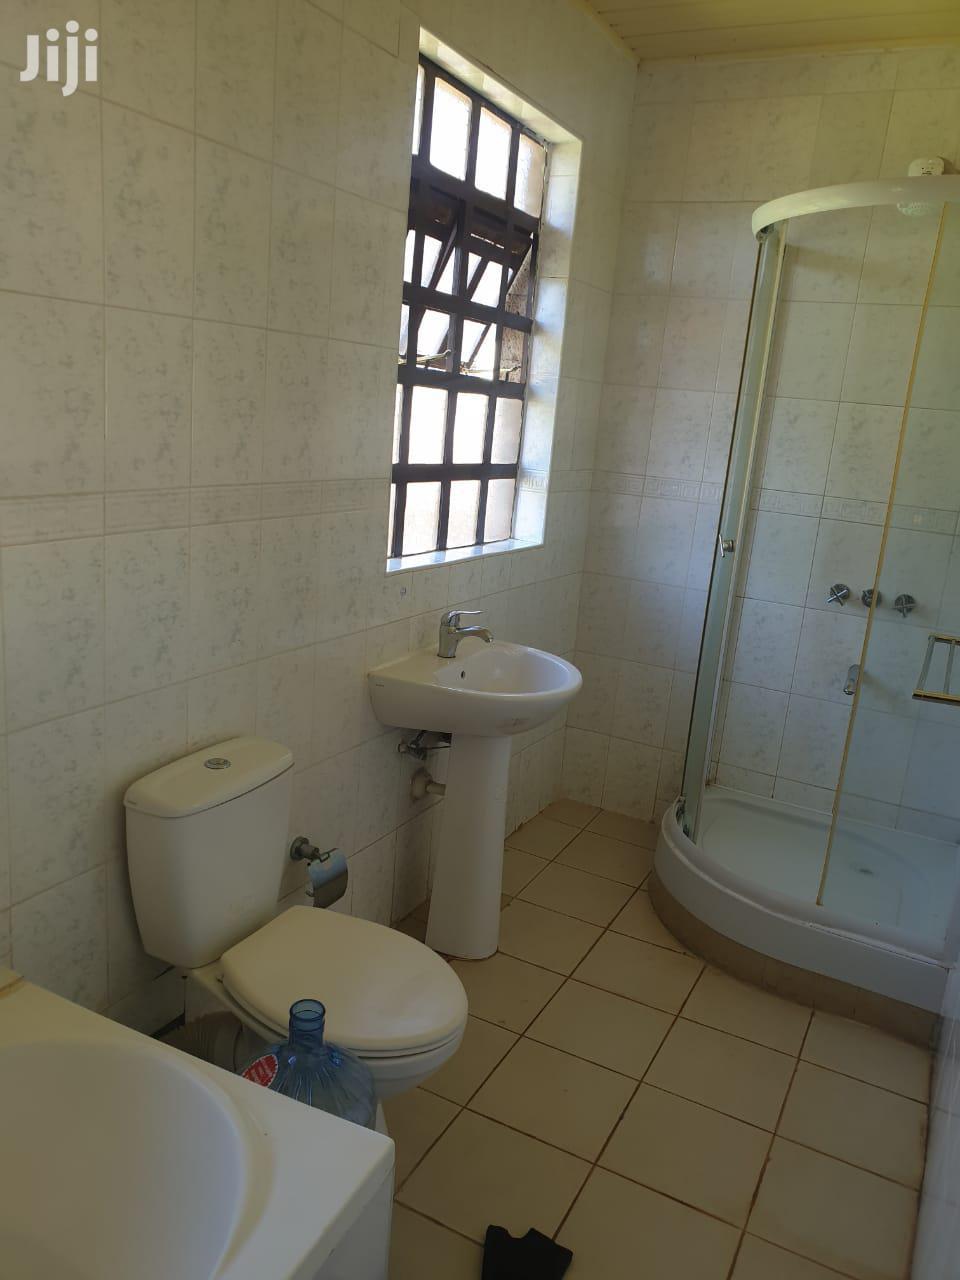 Dont Miss This! Runda Four Bedroom Maissonatte.   Houses & Apartments For Rent for sale in Kitisuru, Nairobi, Kenya